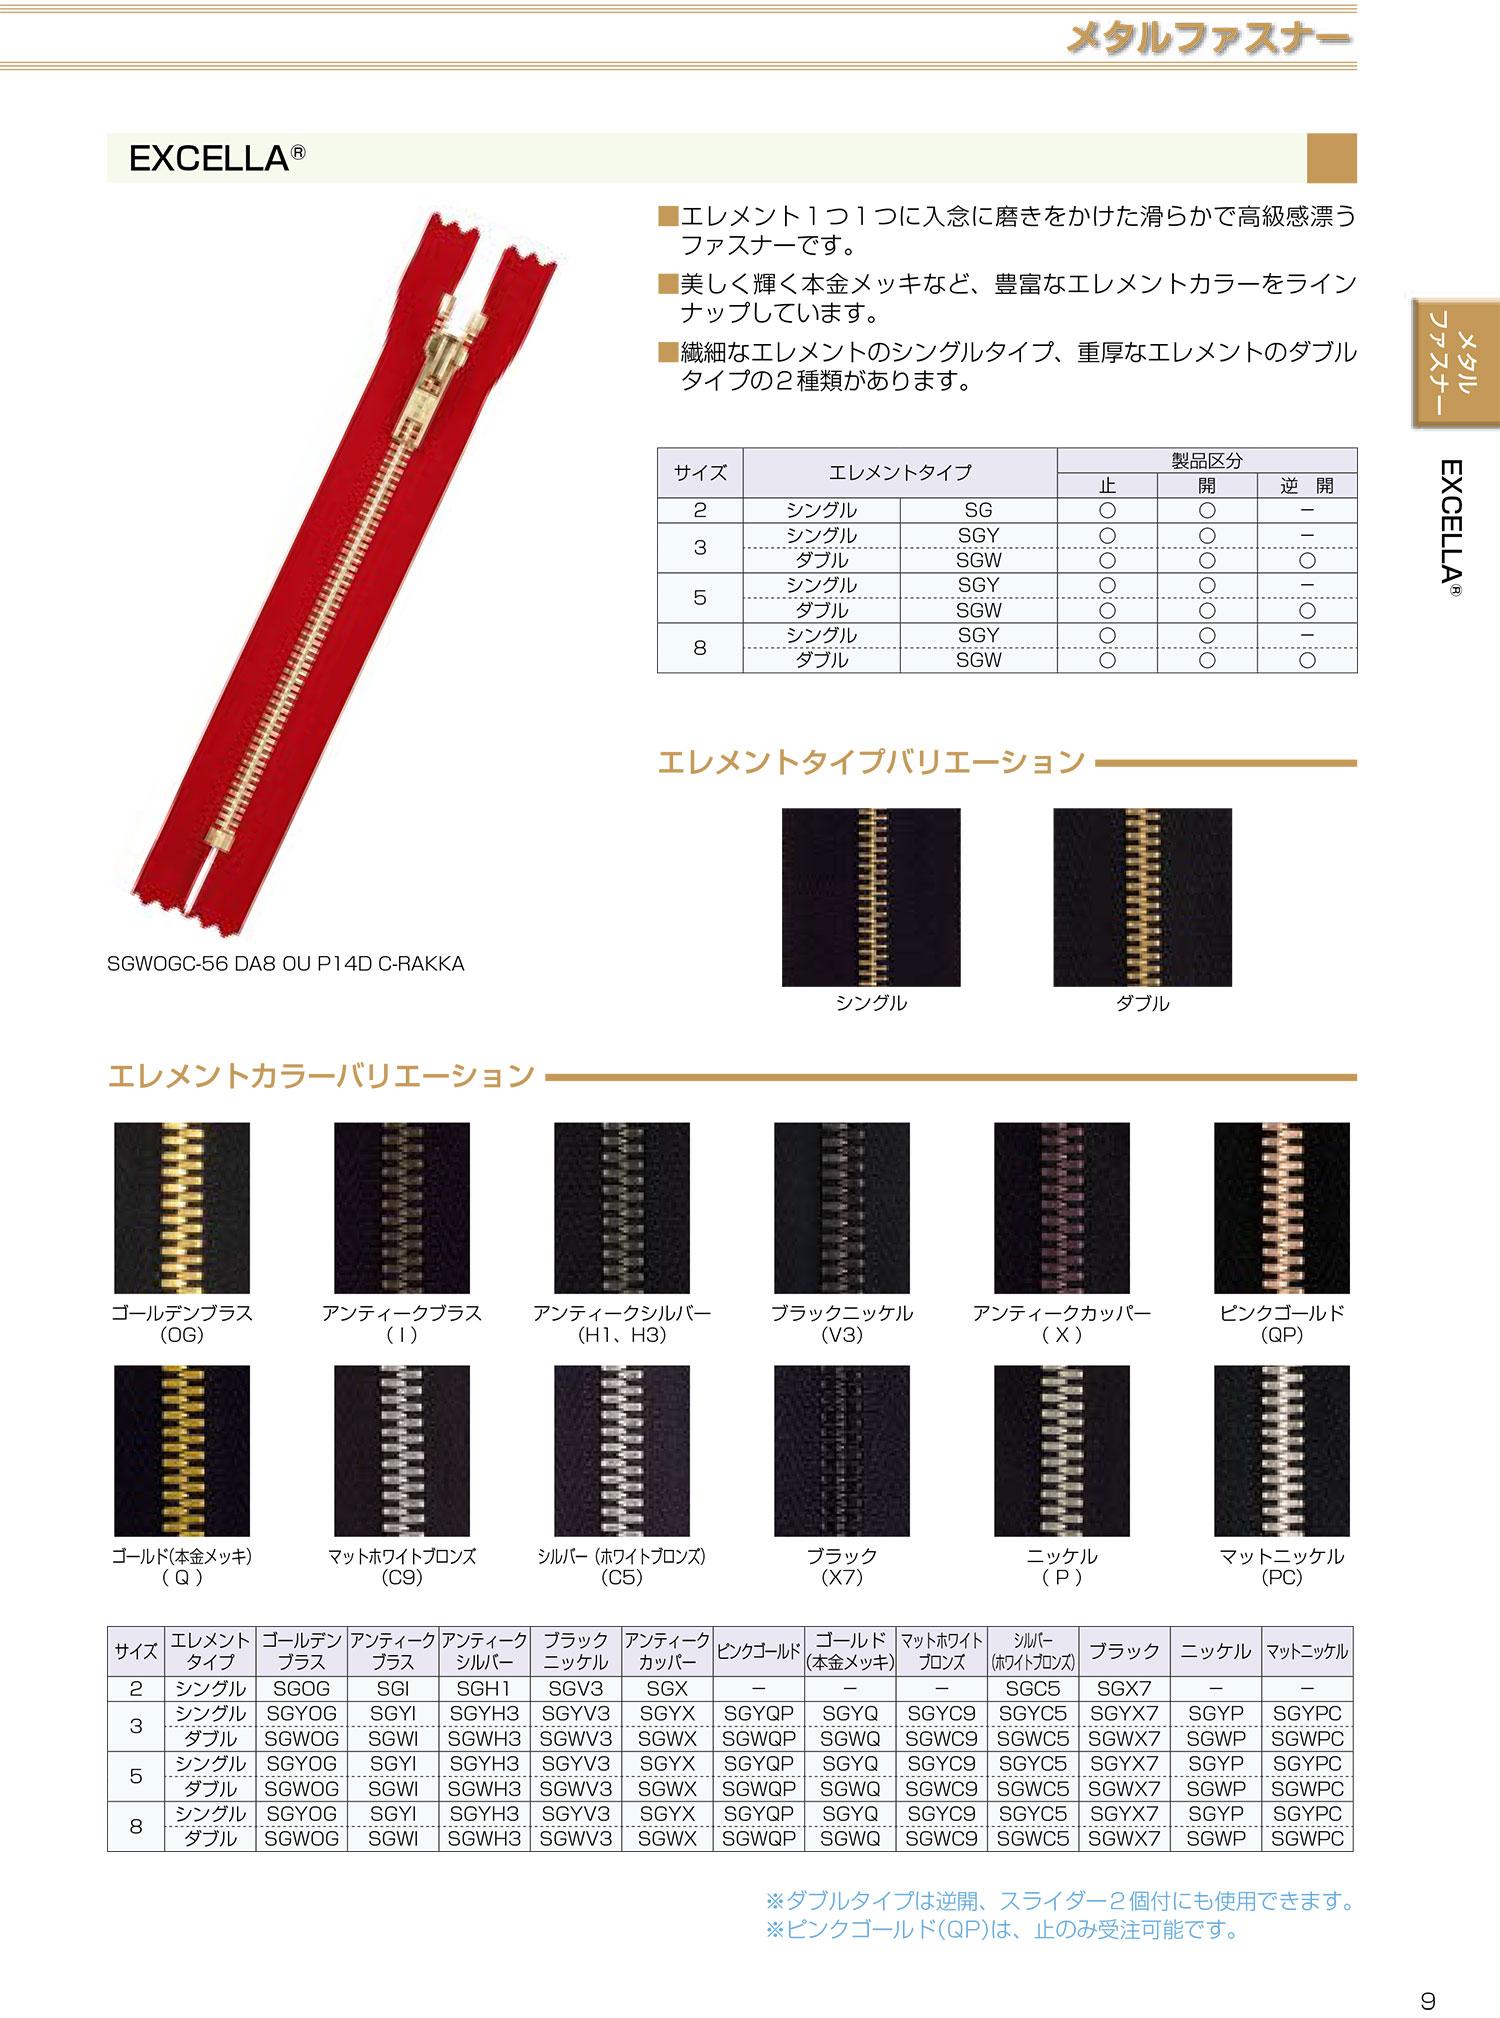 3SGYV3OR エクセラ 3サイズ ブラックニッケル オープン シングル[ファスナー] YKK/オークラ商事 - ApparelX アパレル資材卸通販